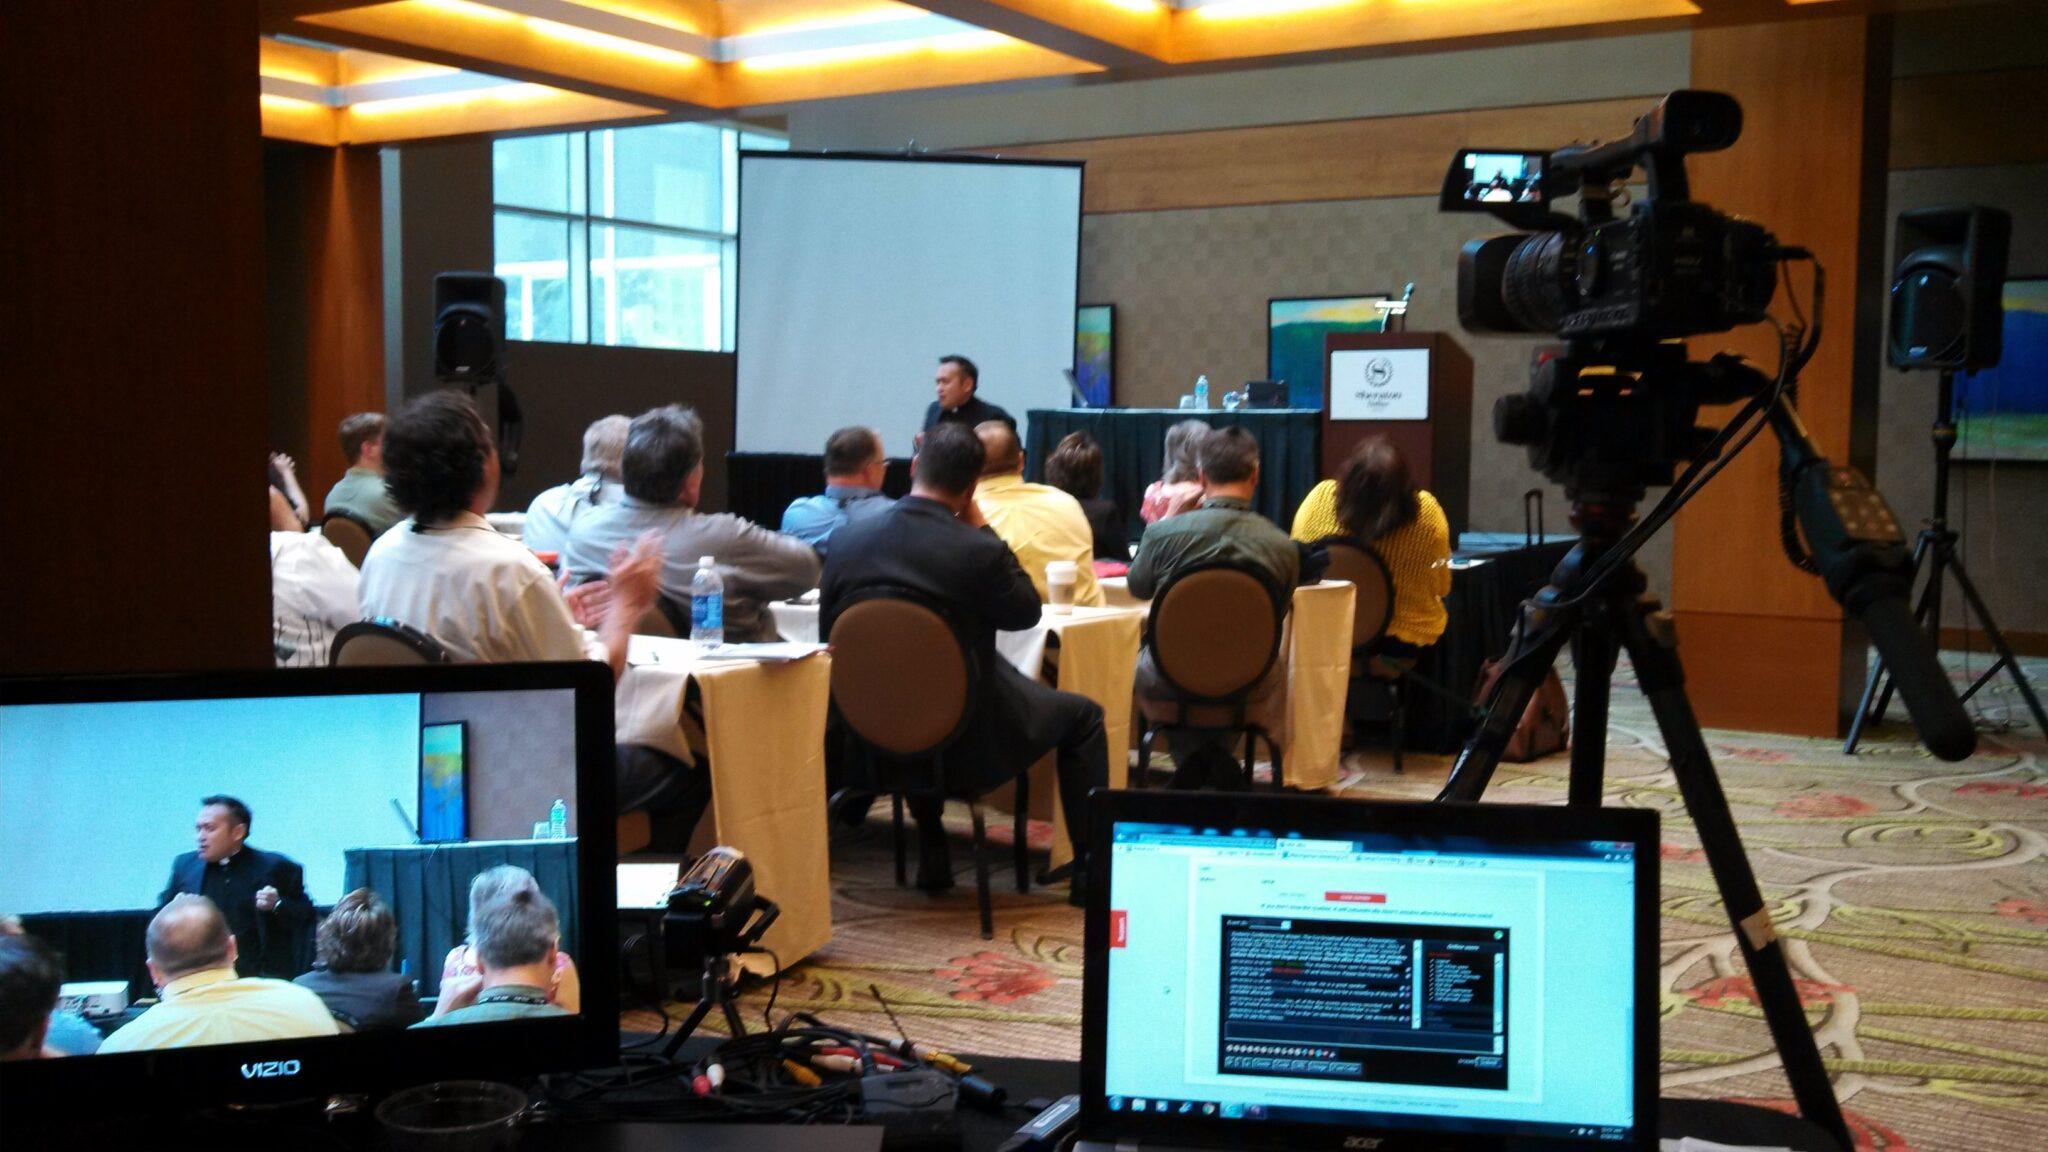 conferencestream